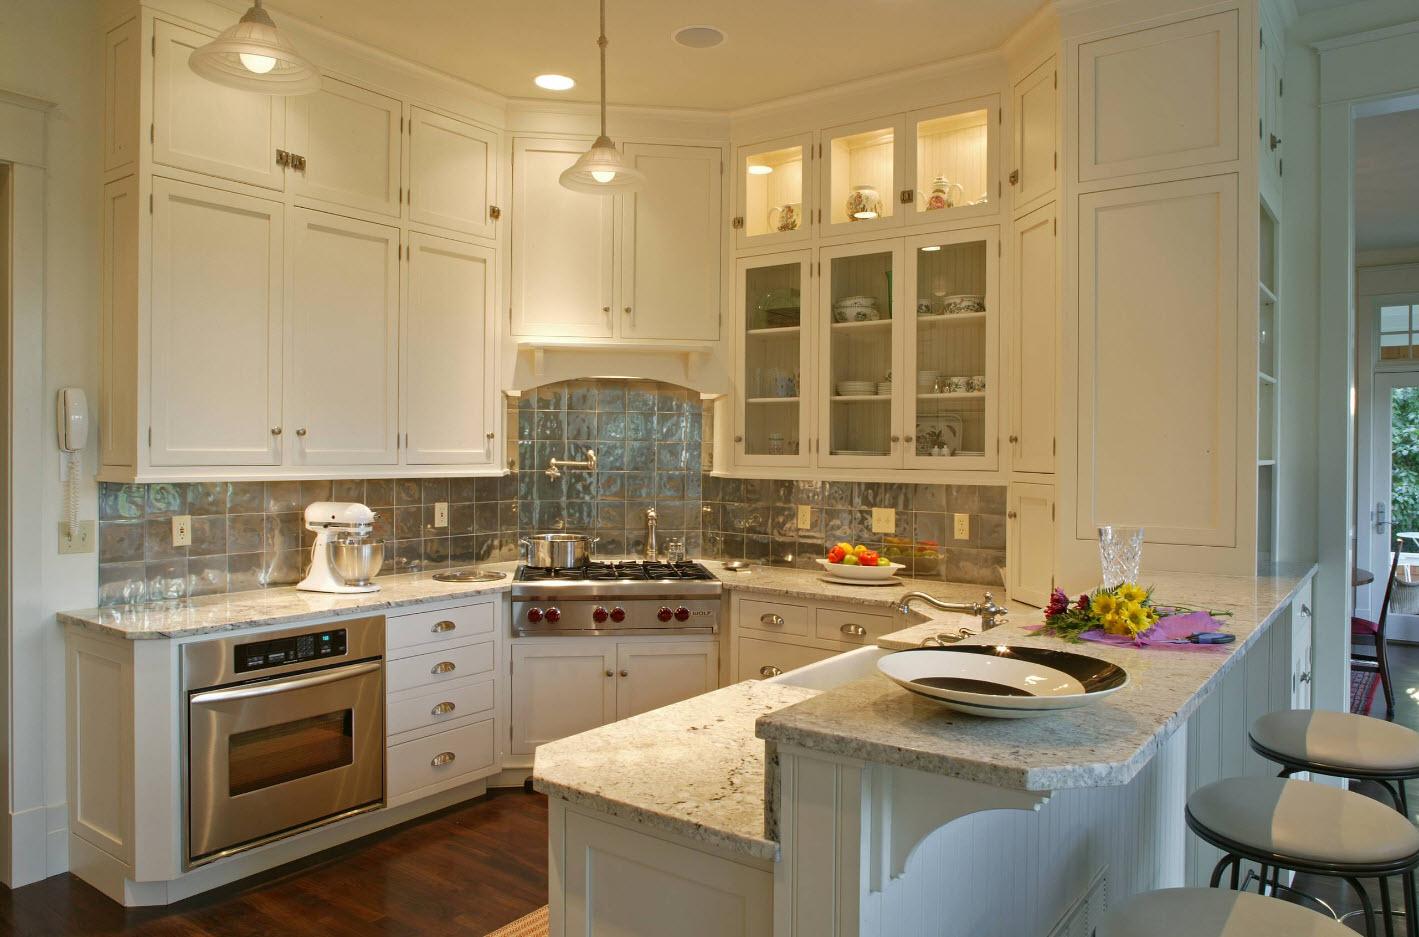 White classic kitchen facades